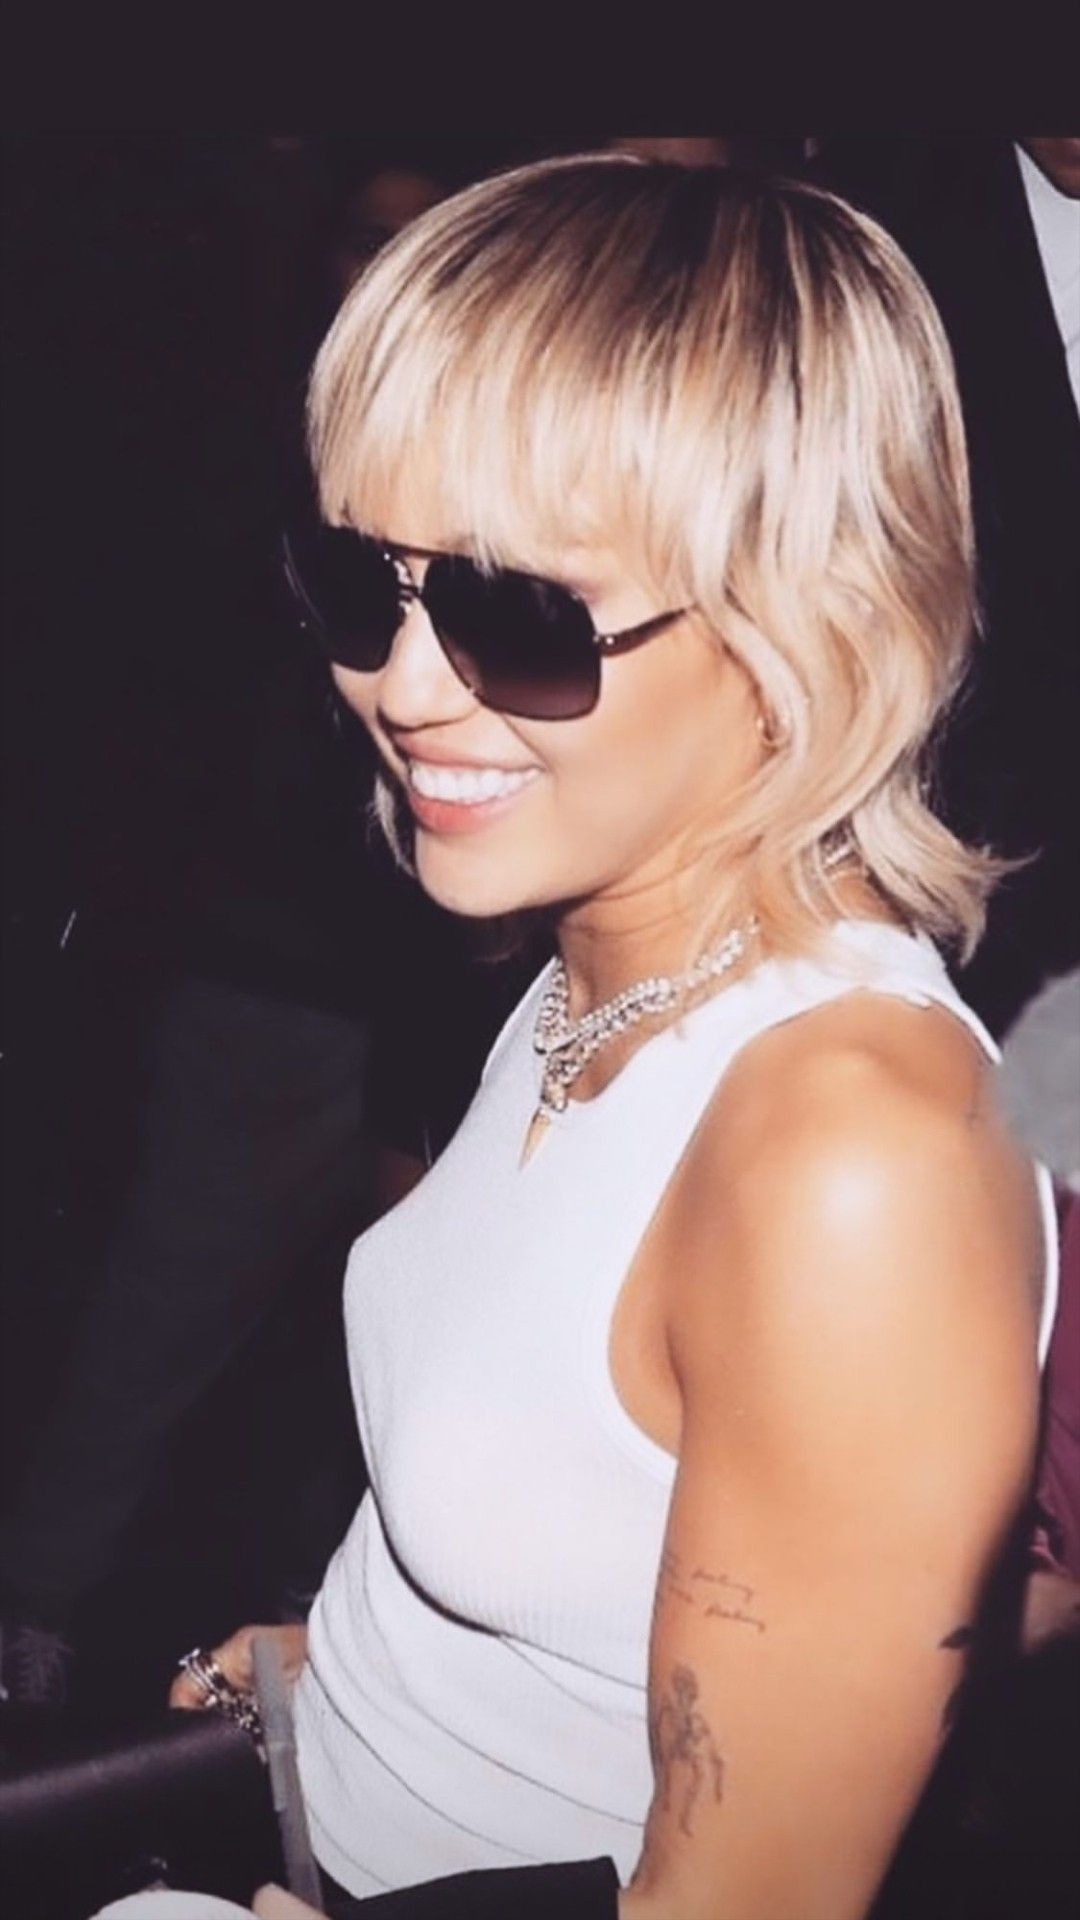 Pin By Amy Sandler On Miley Cyrus In 2020 Miley Cyrus Long Hair Miley Cyrus Hair Modern Mullet Haircut